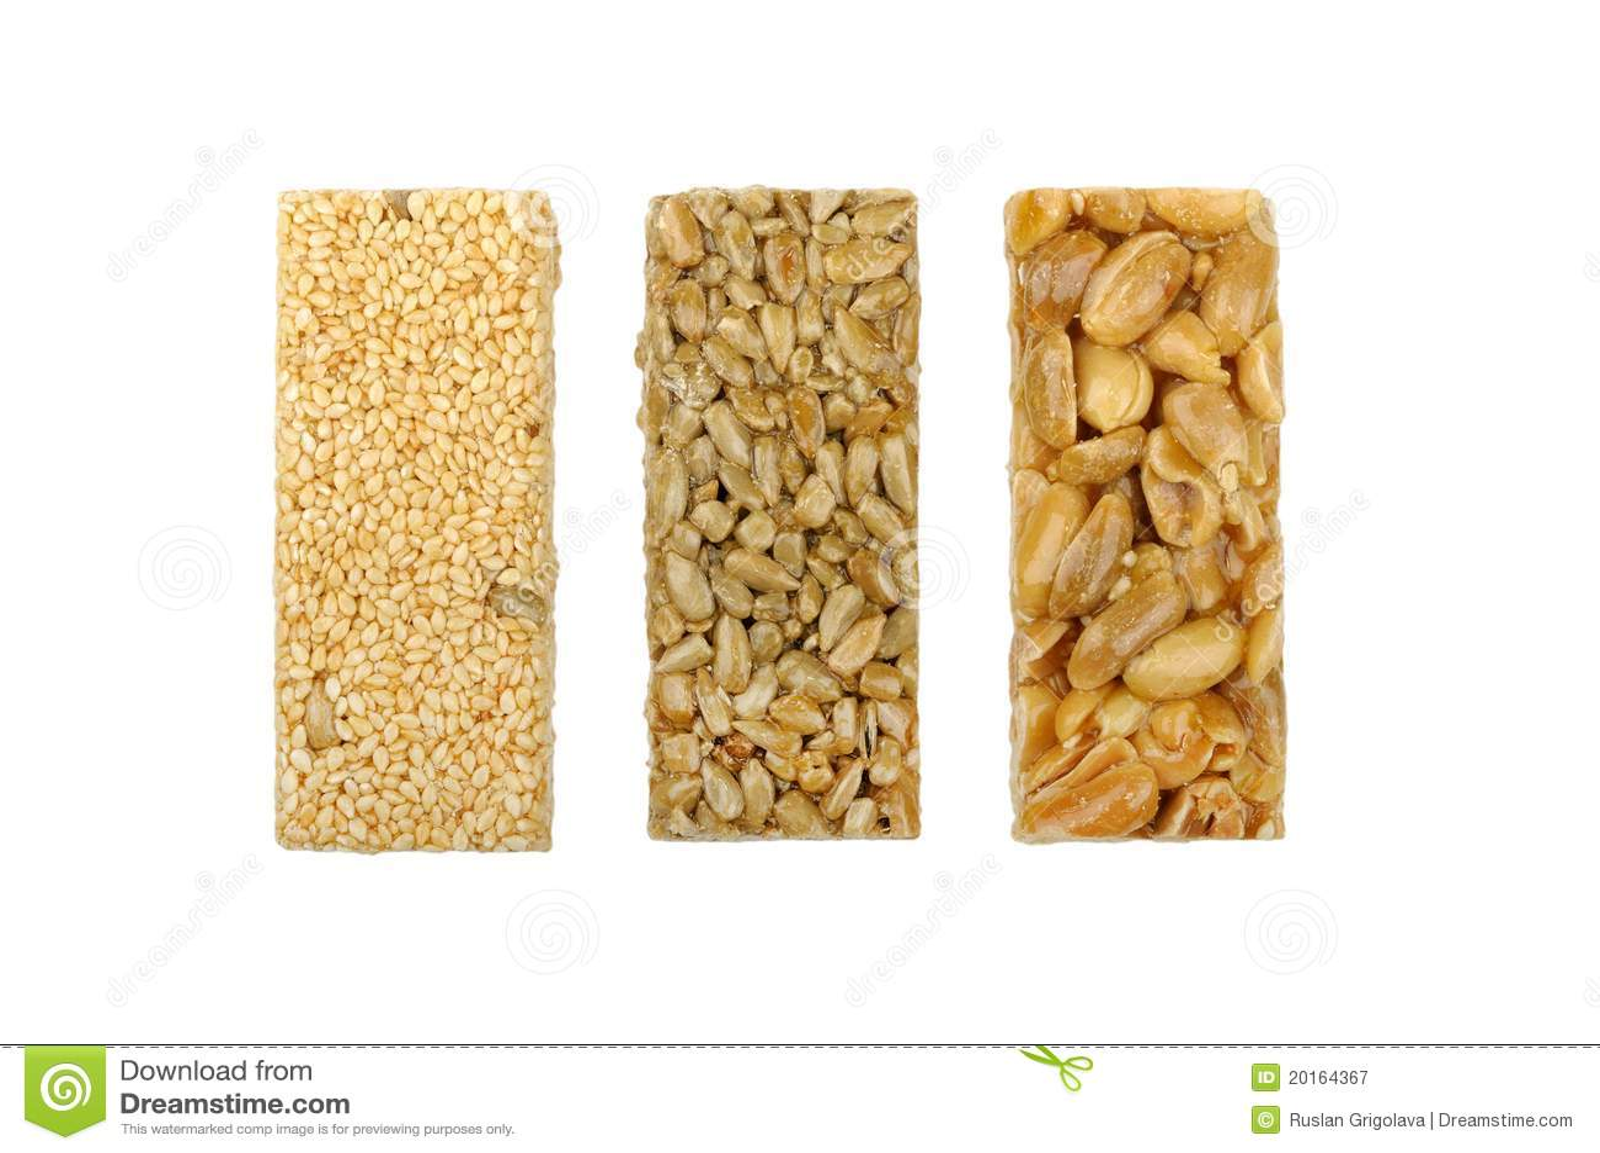 Gozinaki of sunflower seeds sesame seeds and peanuts isolated on a    Gozinaki